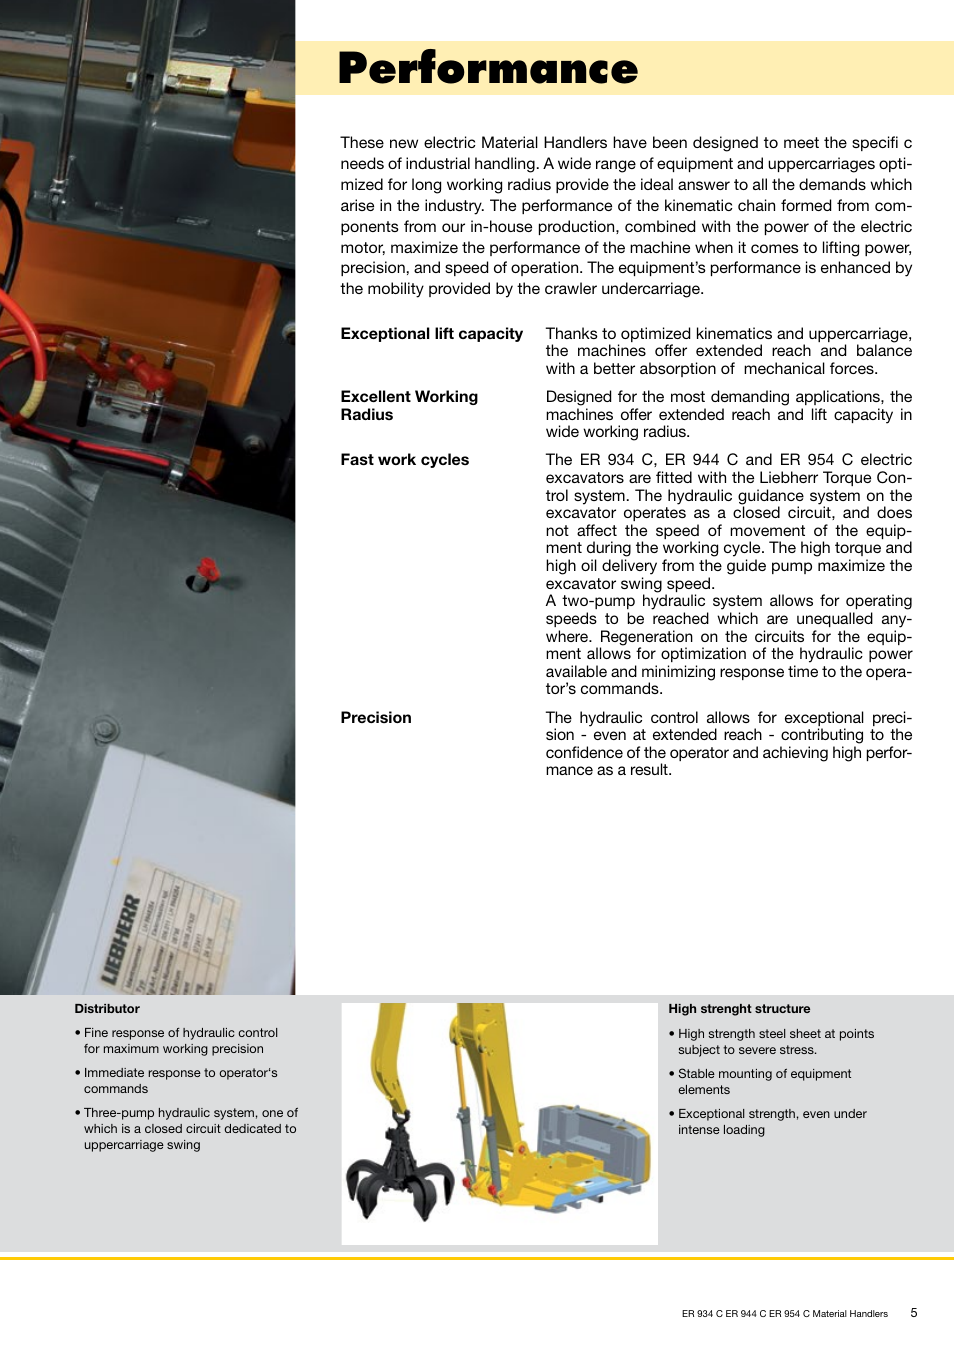 Performance | Liebherr ER 954 C Material Handler User Manual